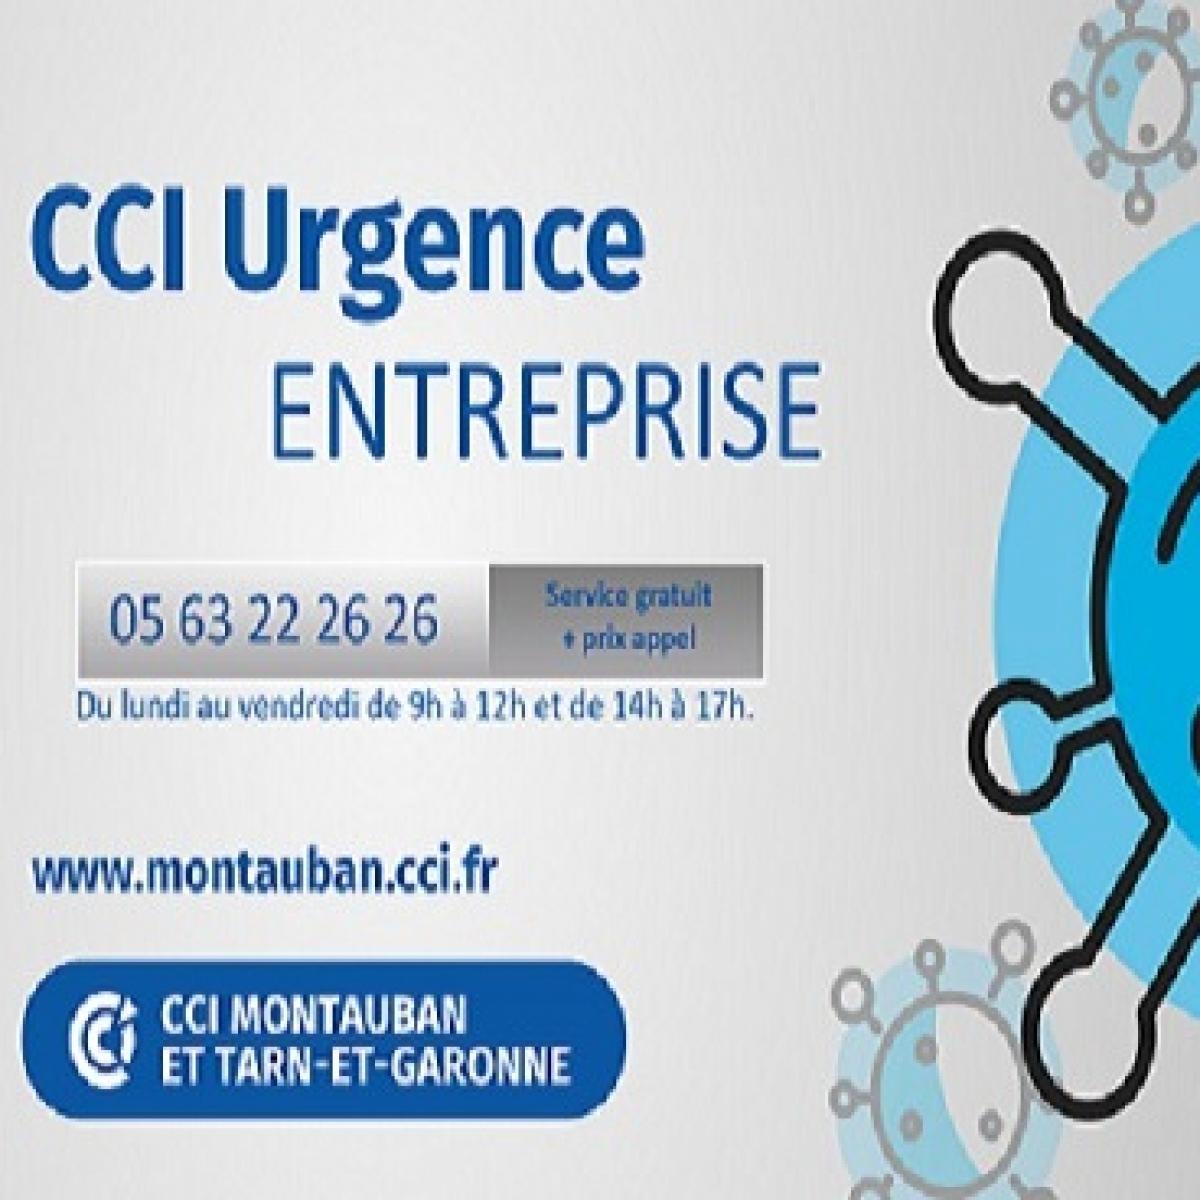 CCI Urgence Entreprise